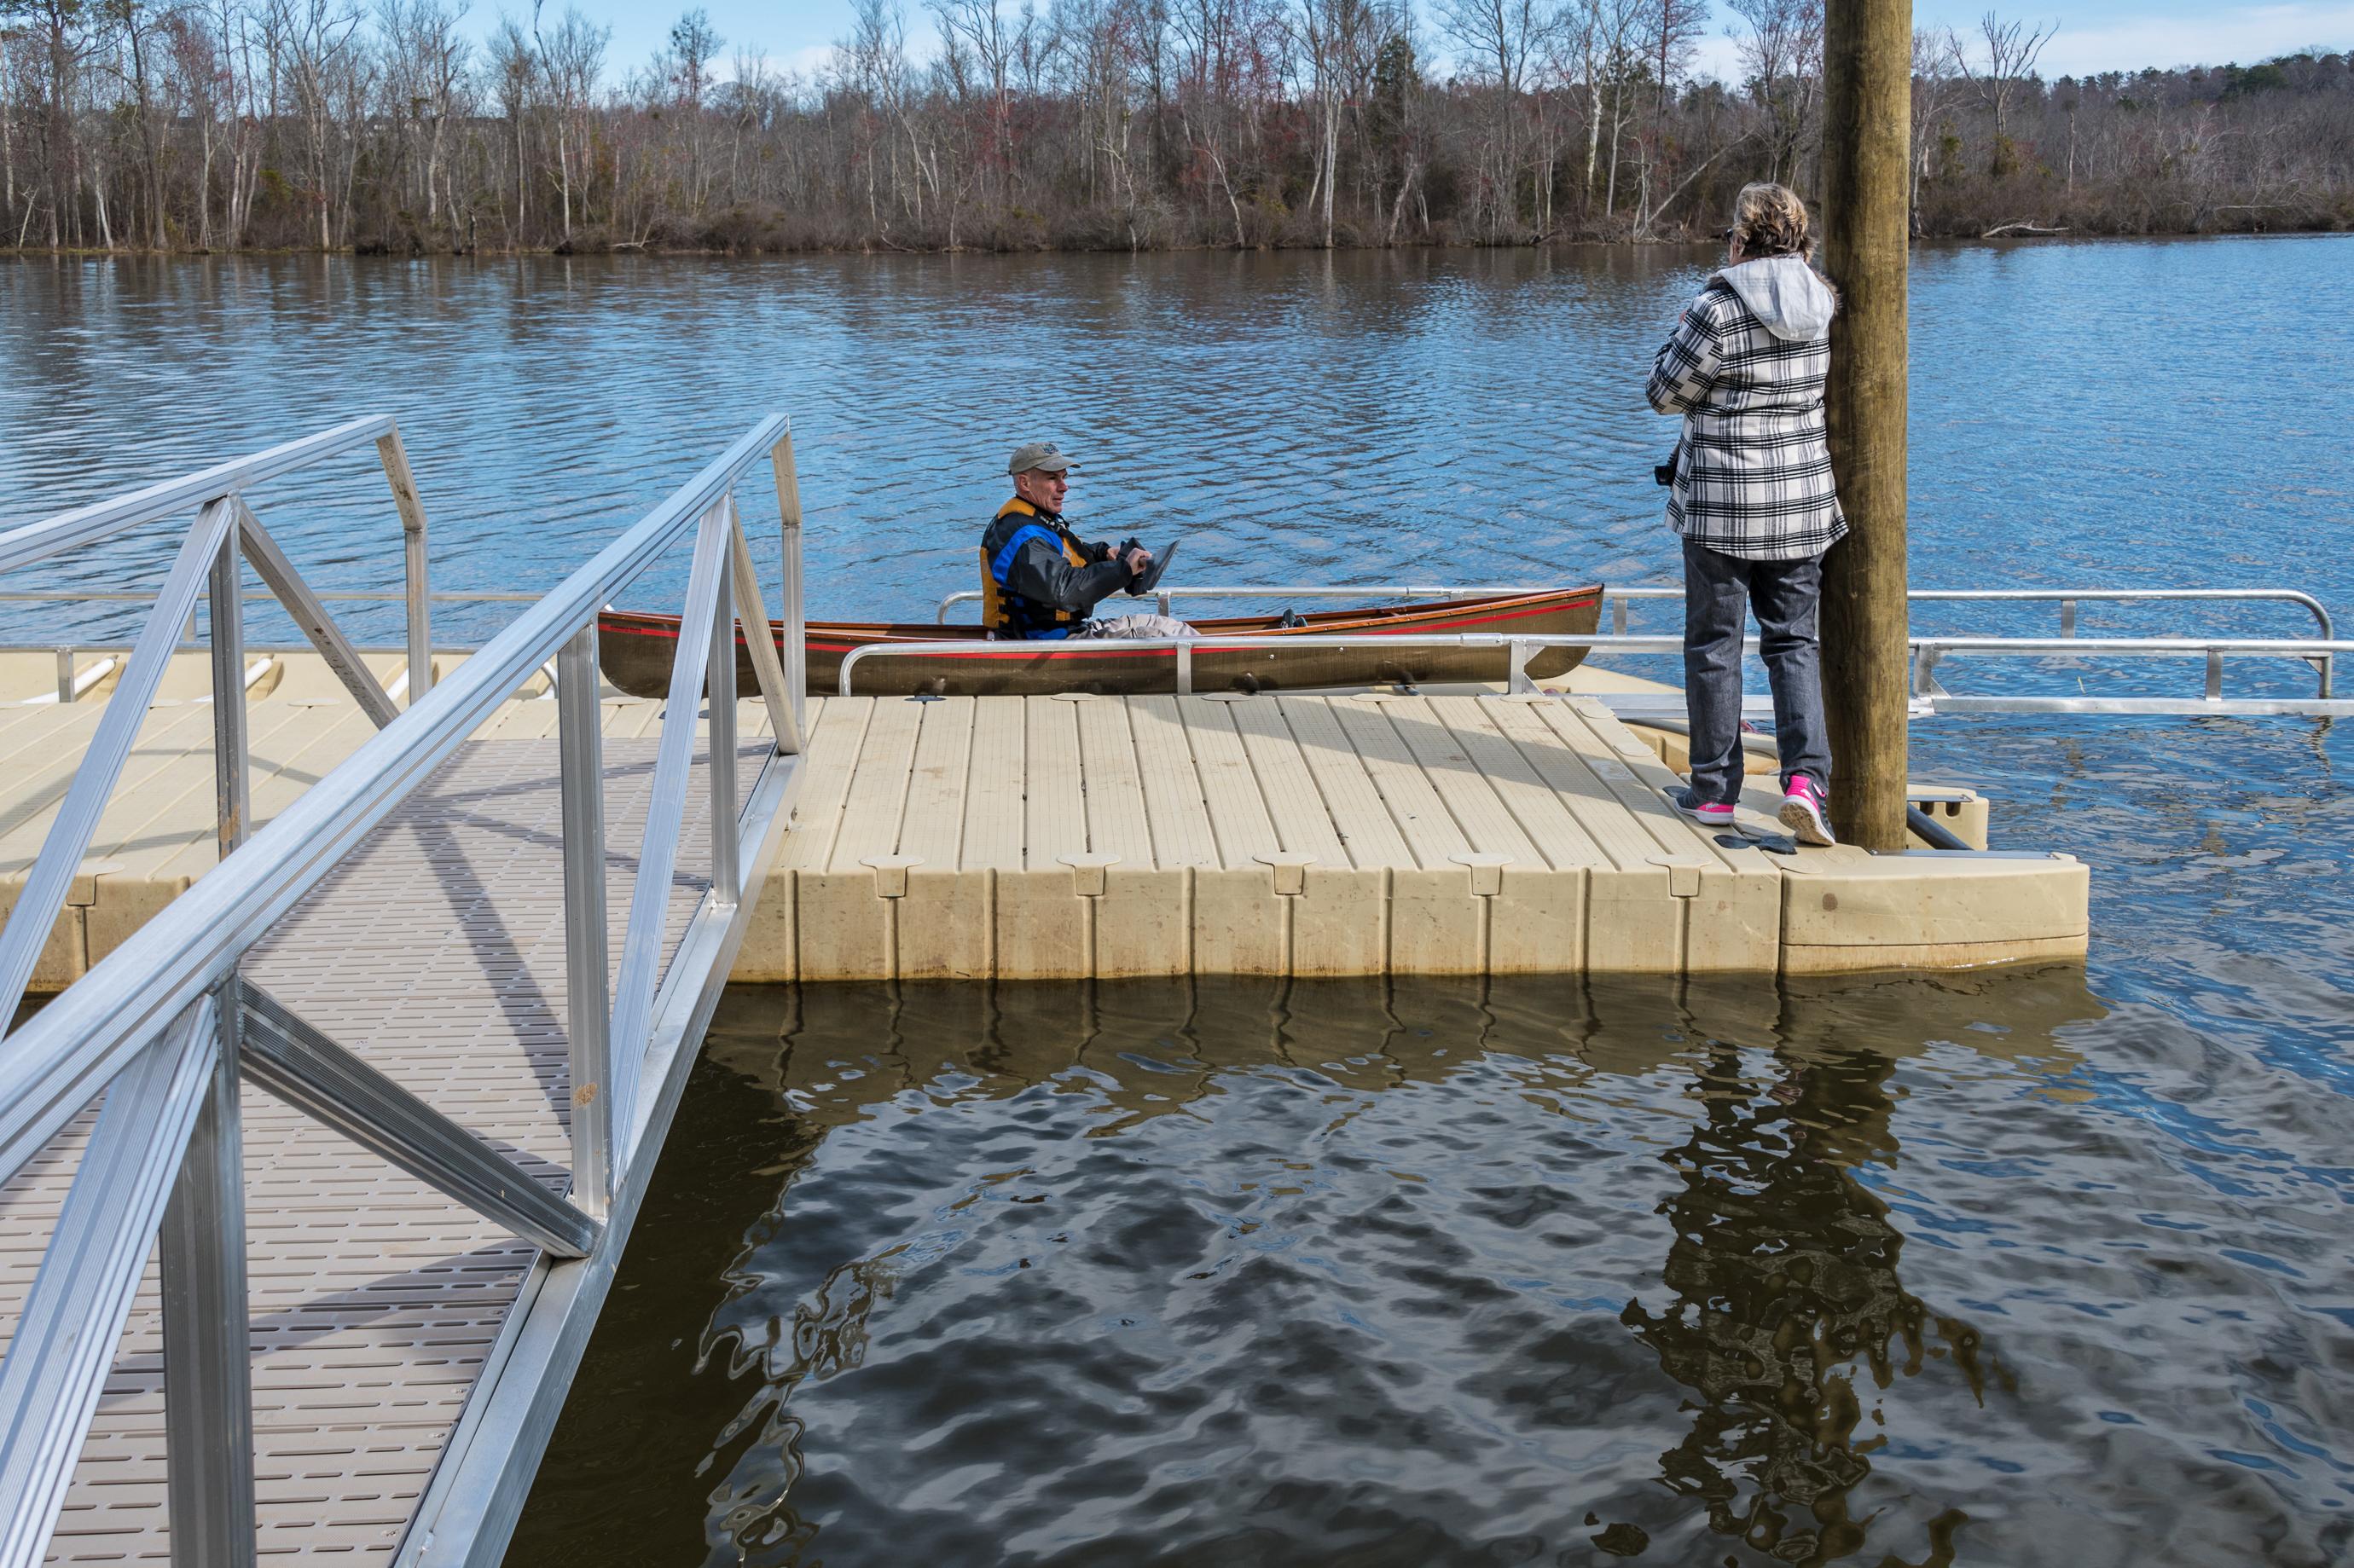 Canoe-Kayak launch opens at Appomattox Regional Riverside Park